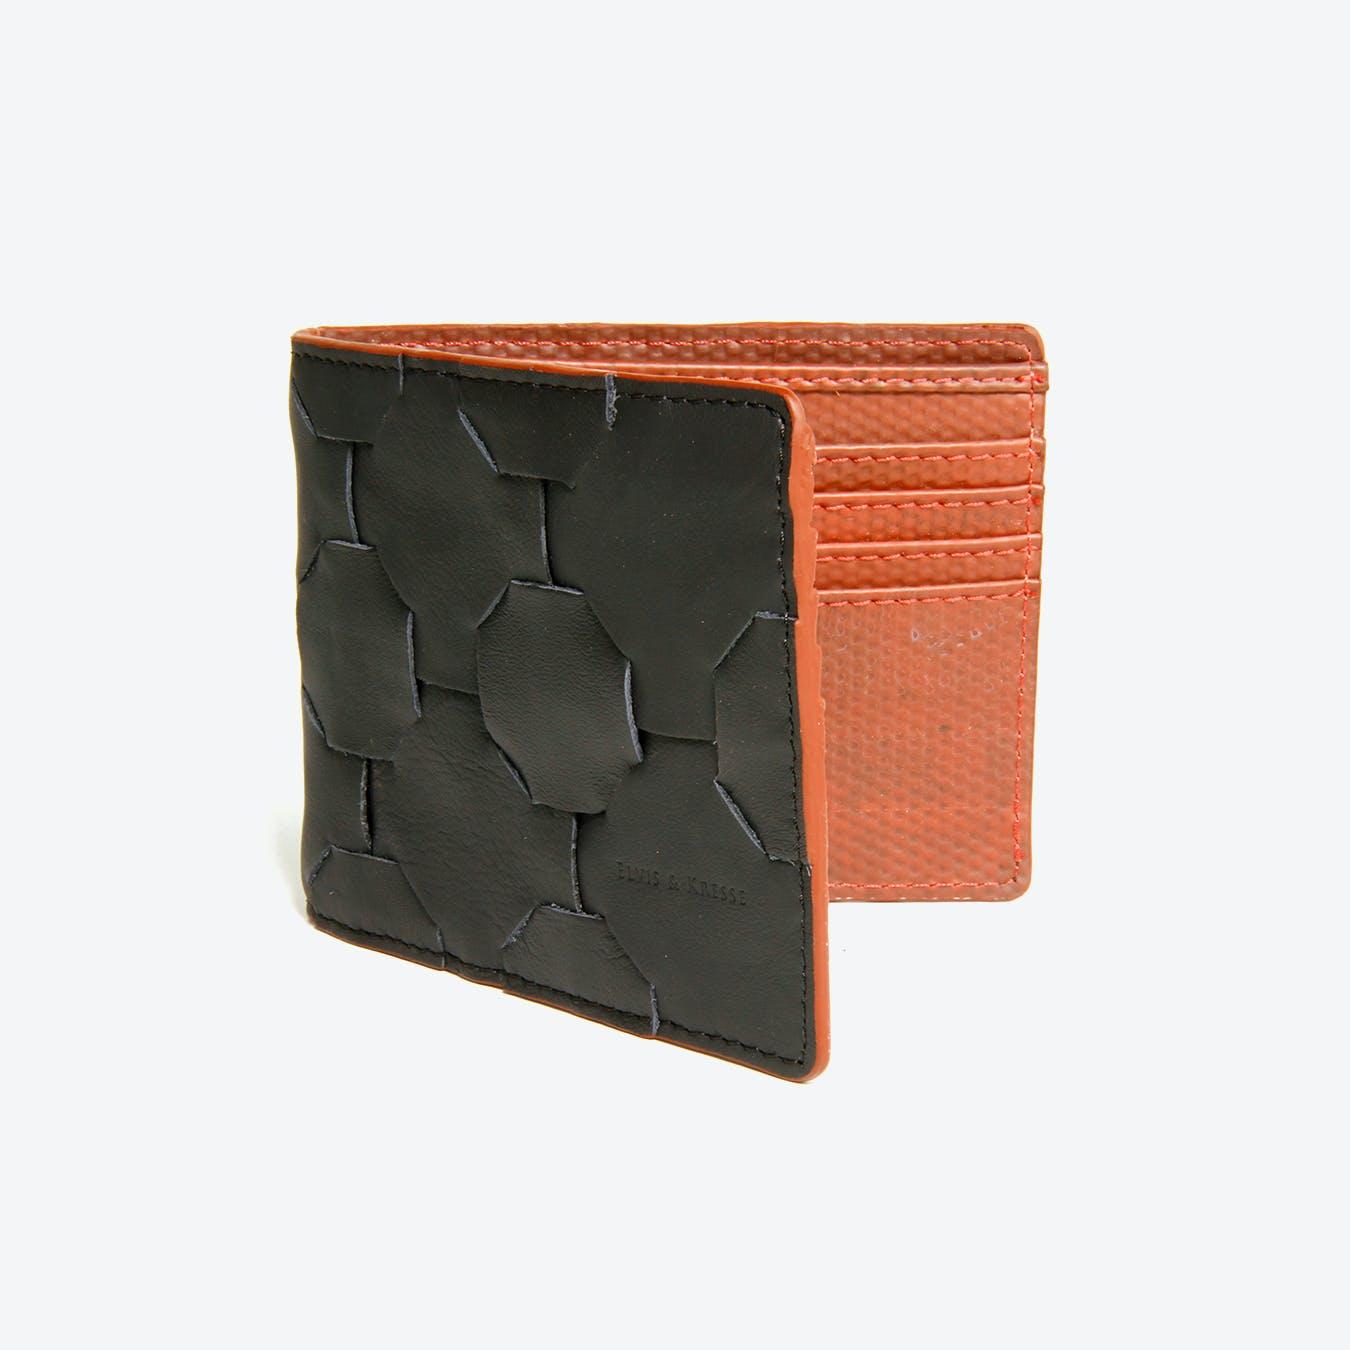 Fire & Hide Wallet in Black Burberry Leather